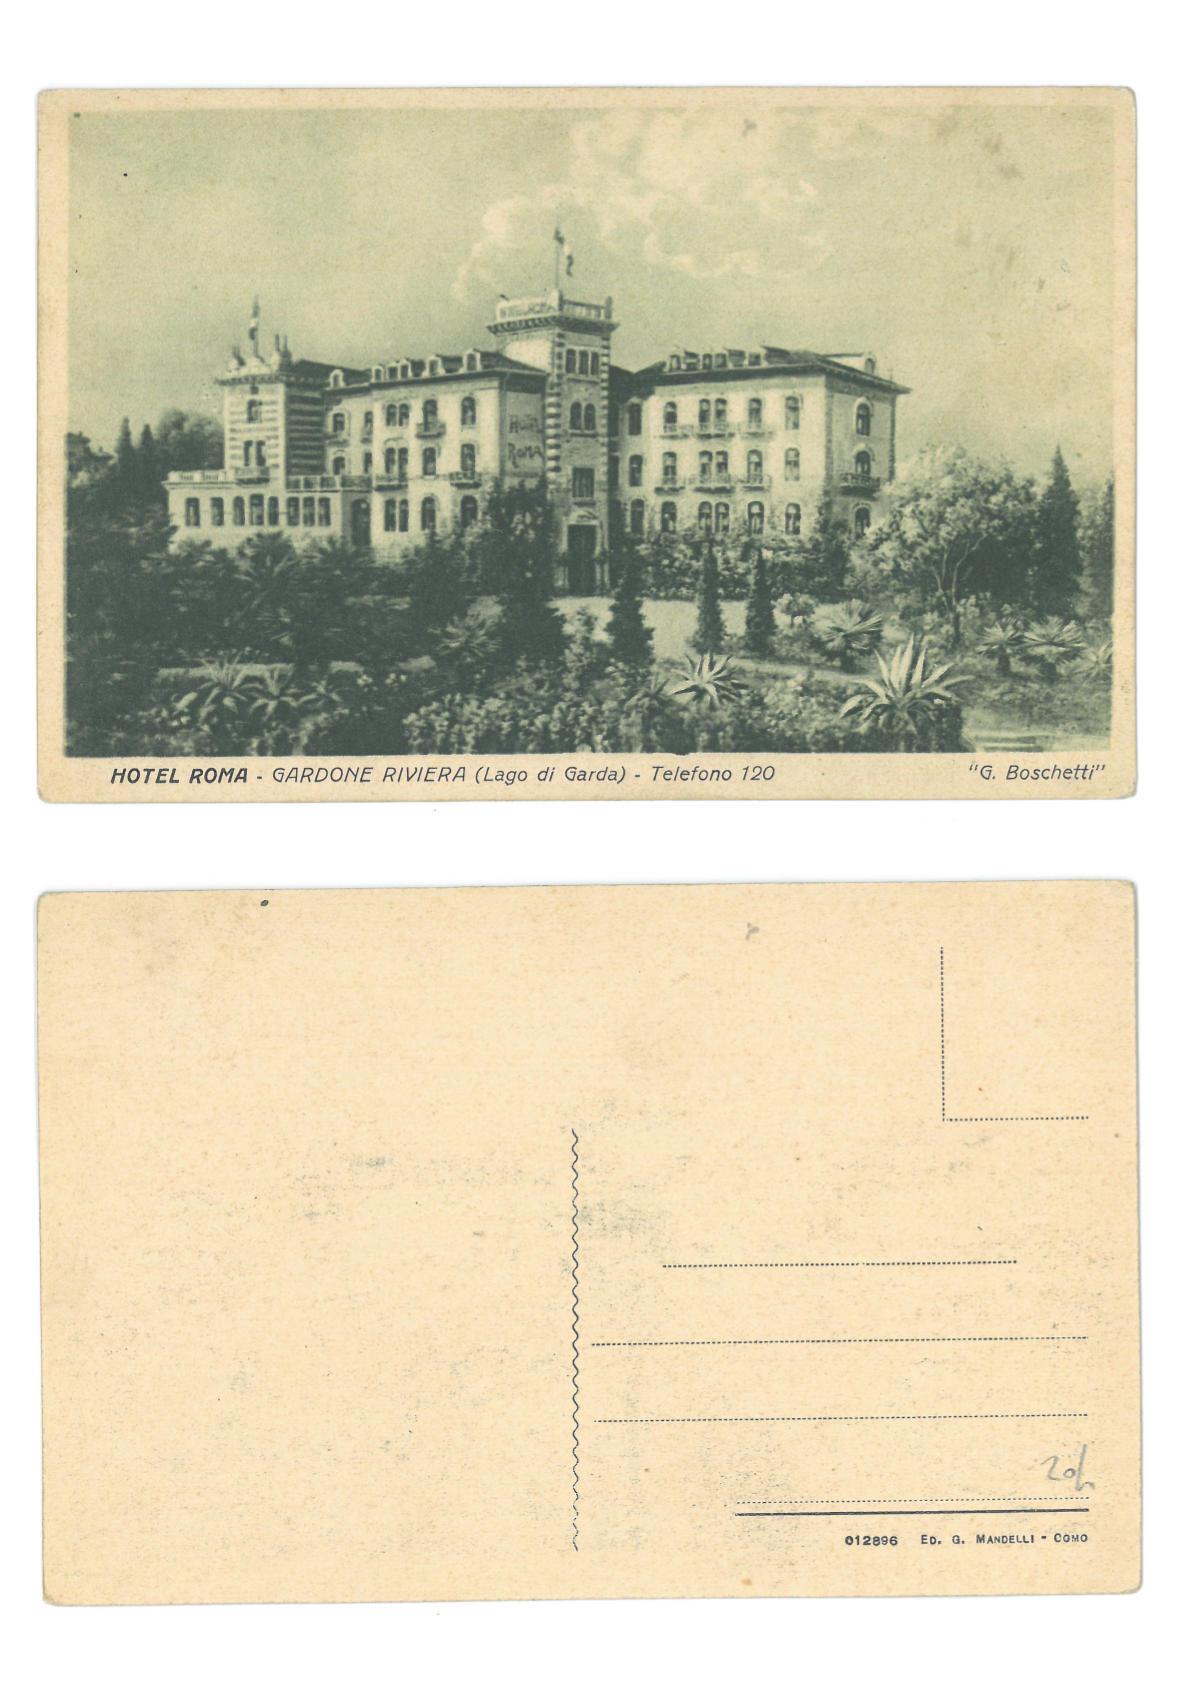 Hotel Roma - Gardone Riviera